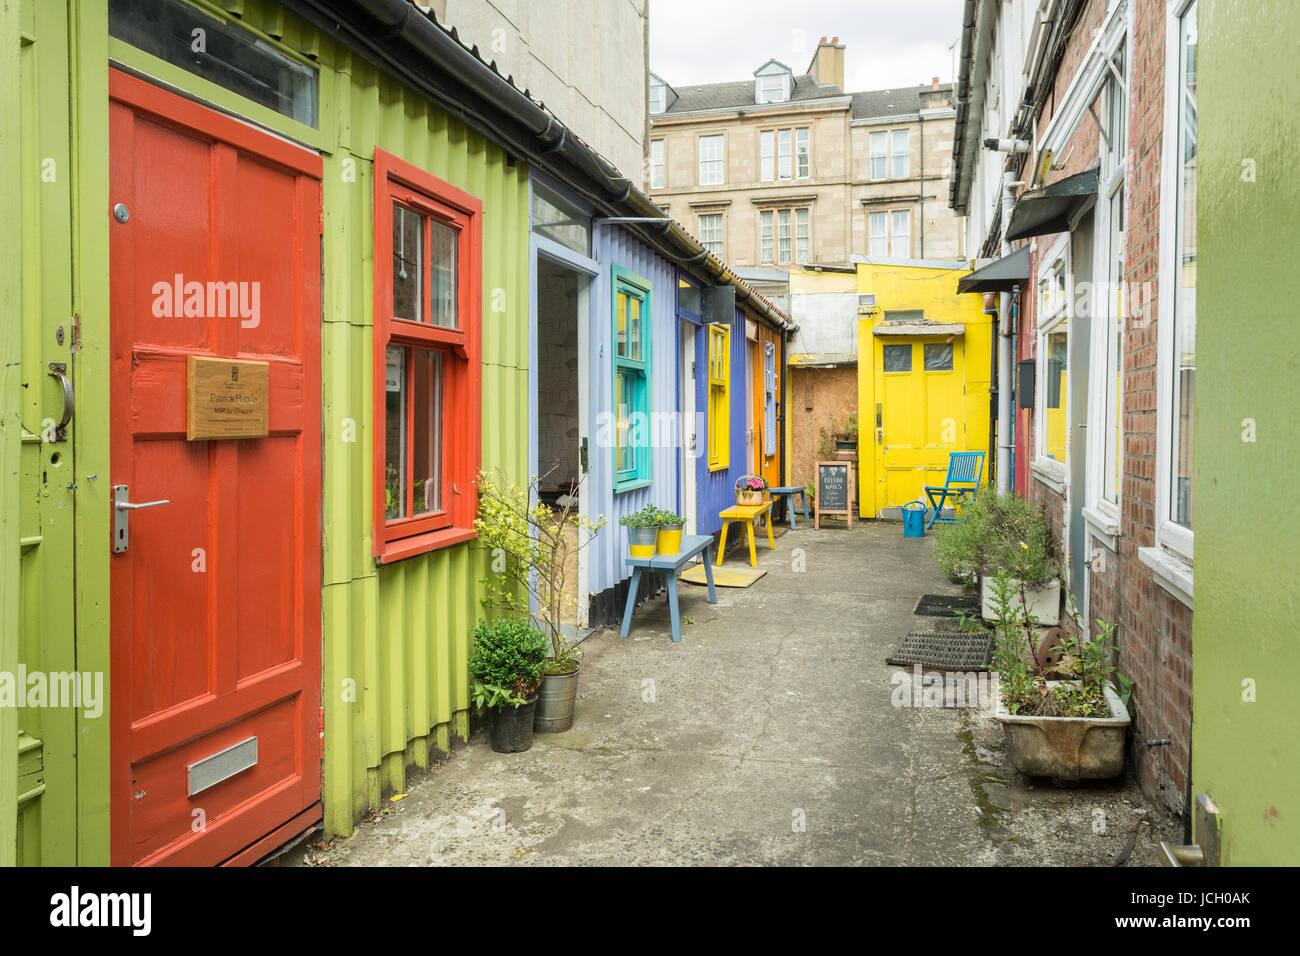 The Hidden Lane, artists community and studios, Argyle Street, Finnieston, Glasgow, Scotland, UK - Stock Image